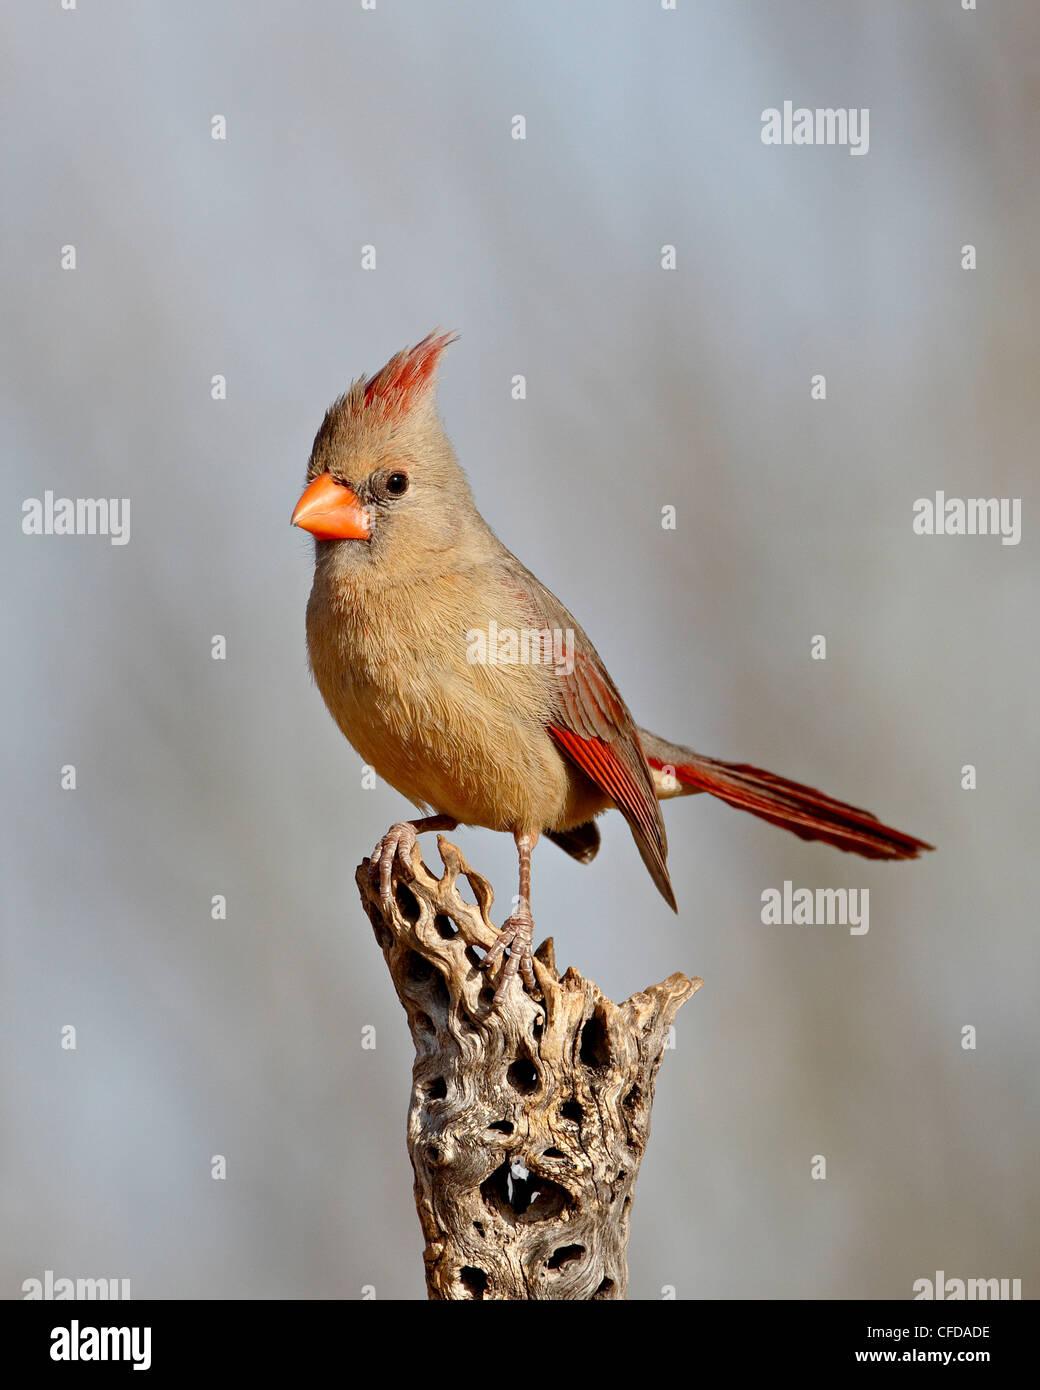 Female northern cardinal (Cardinalis cardinalis), The Pond, Amado, Arizona, United States of America, Stock Photo